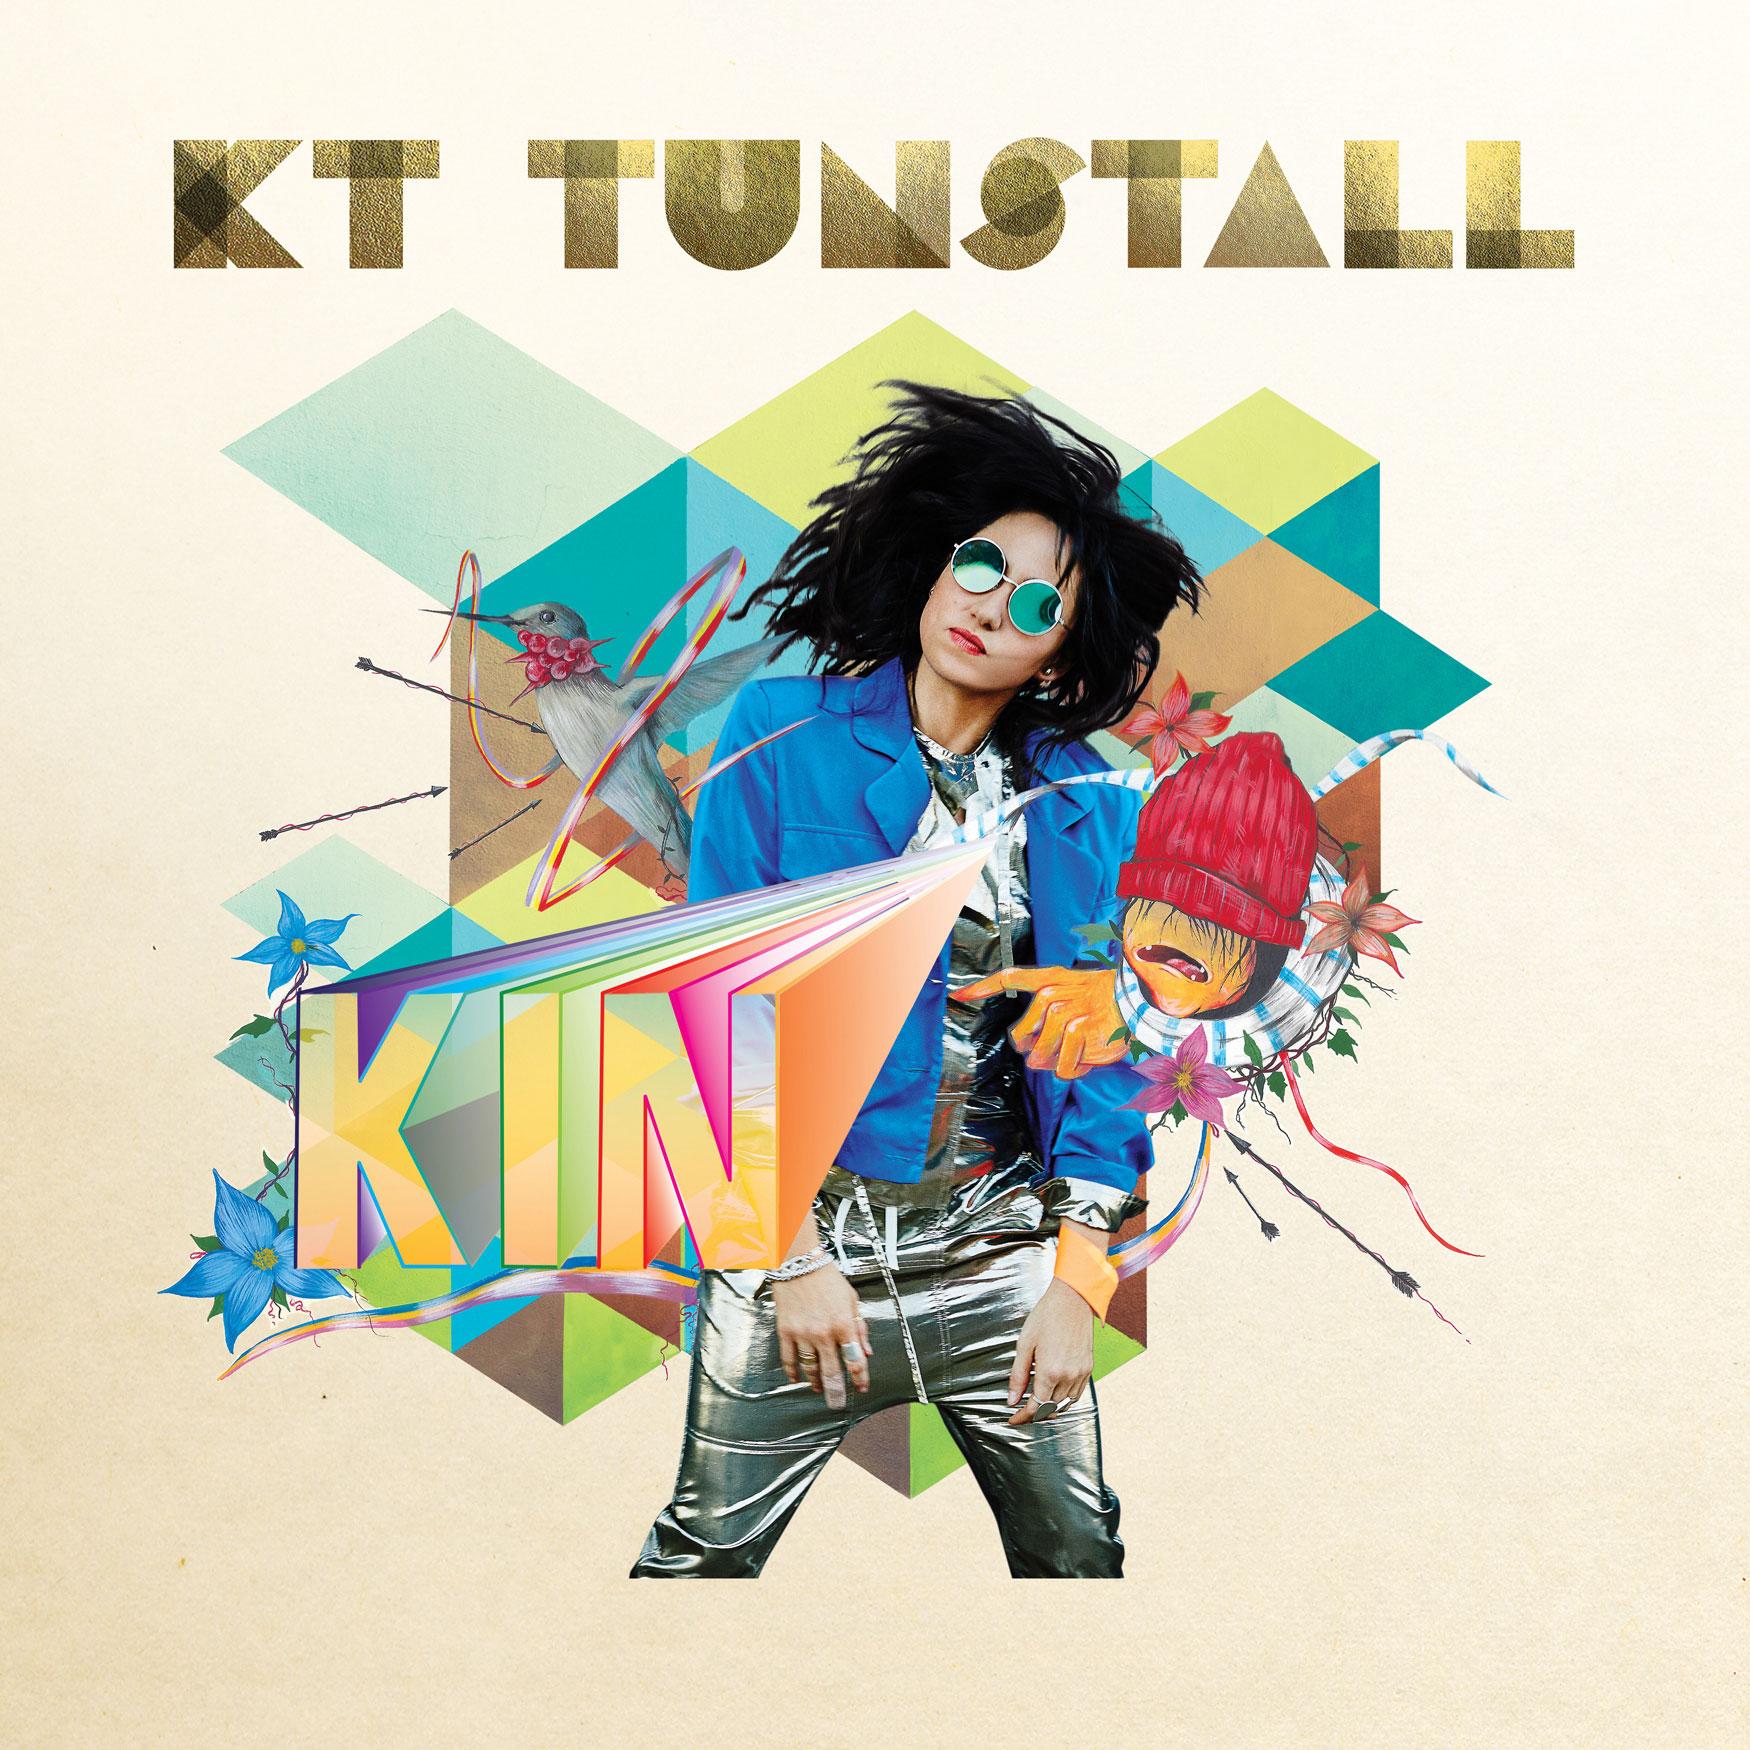 KT Tunstall